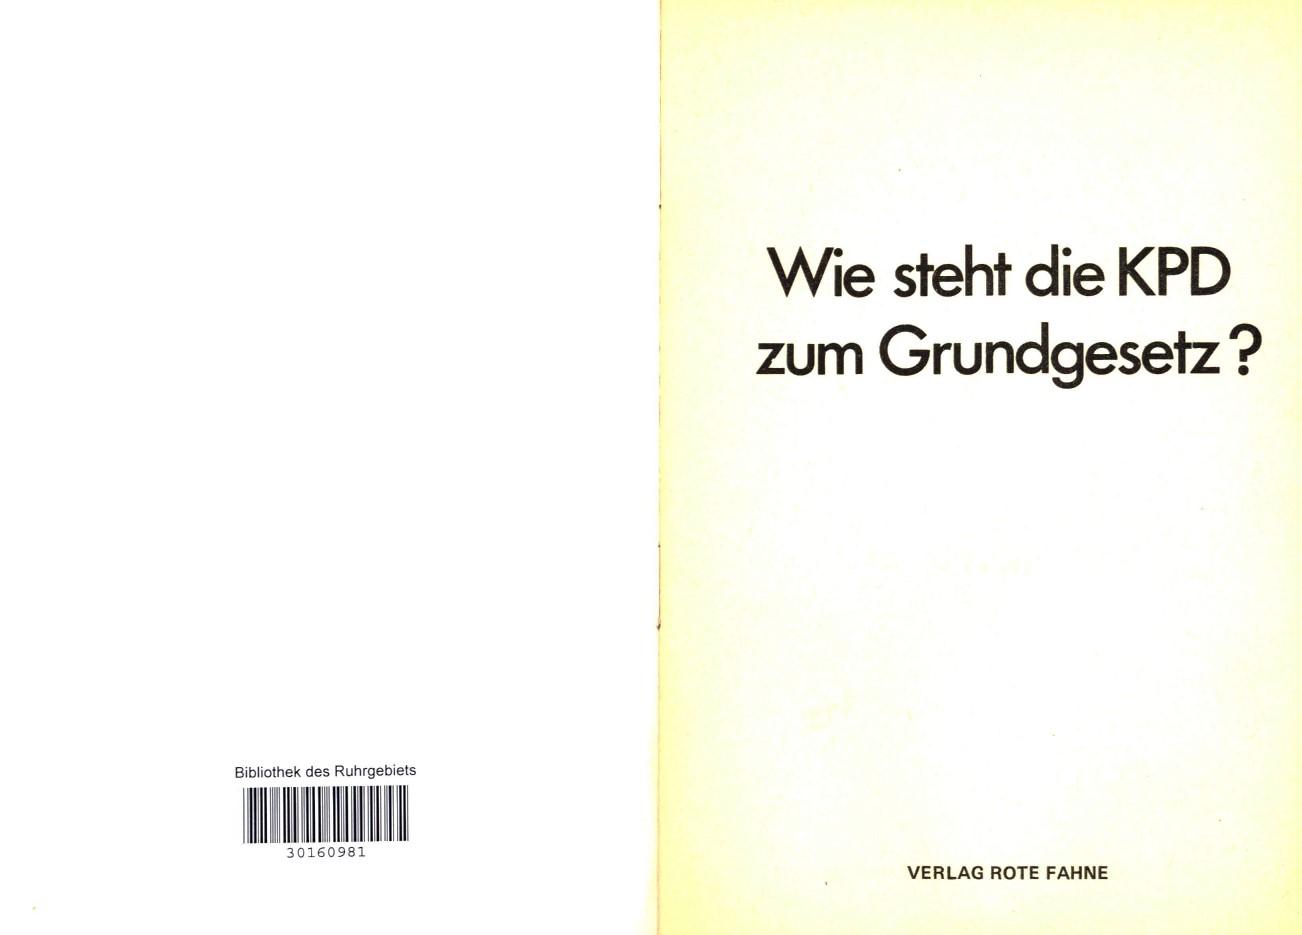 KPDAO_1974_Grundgesetz_02